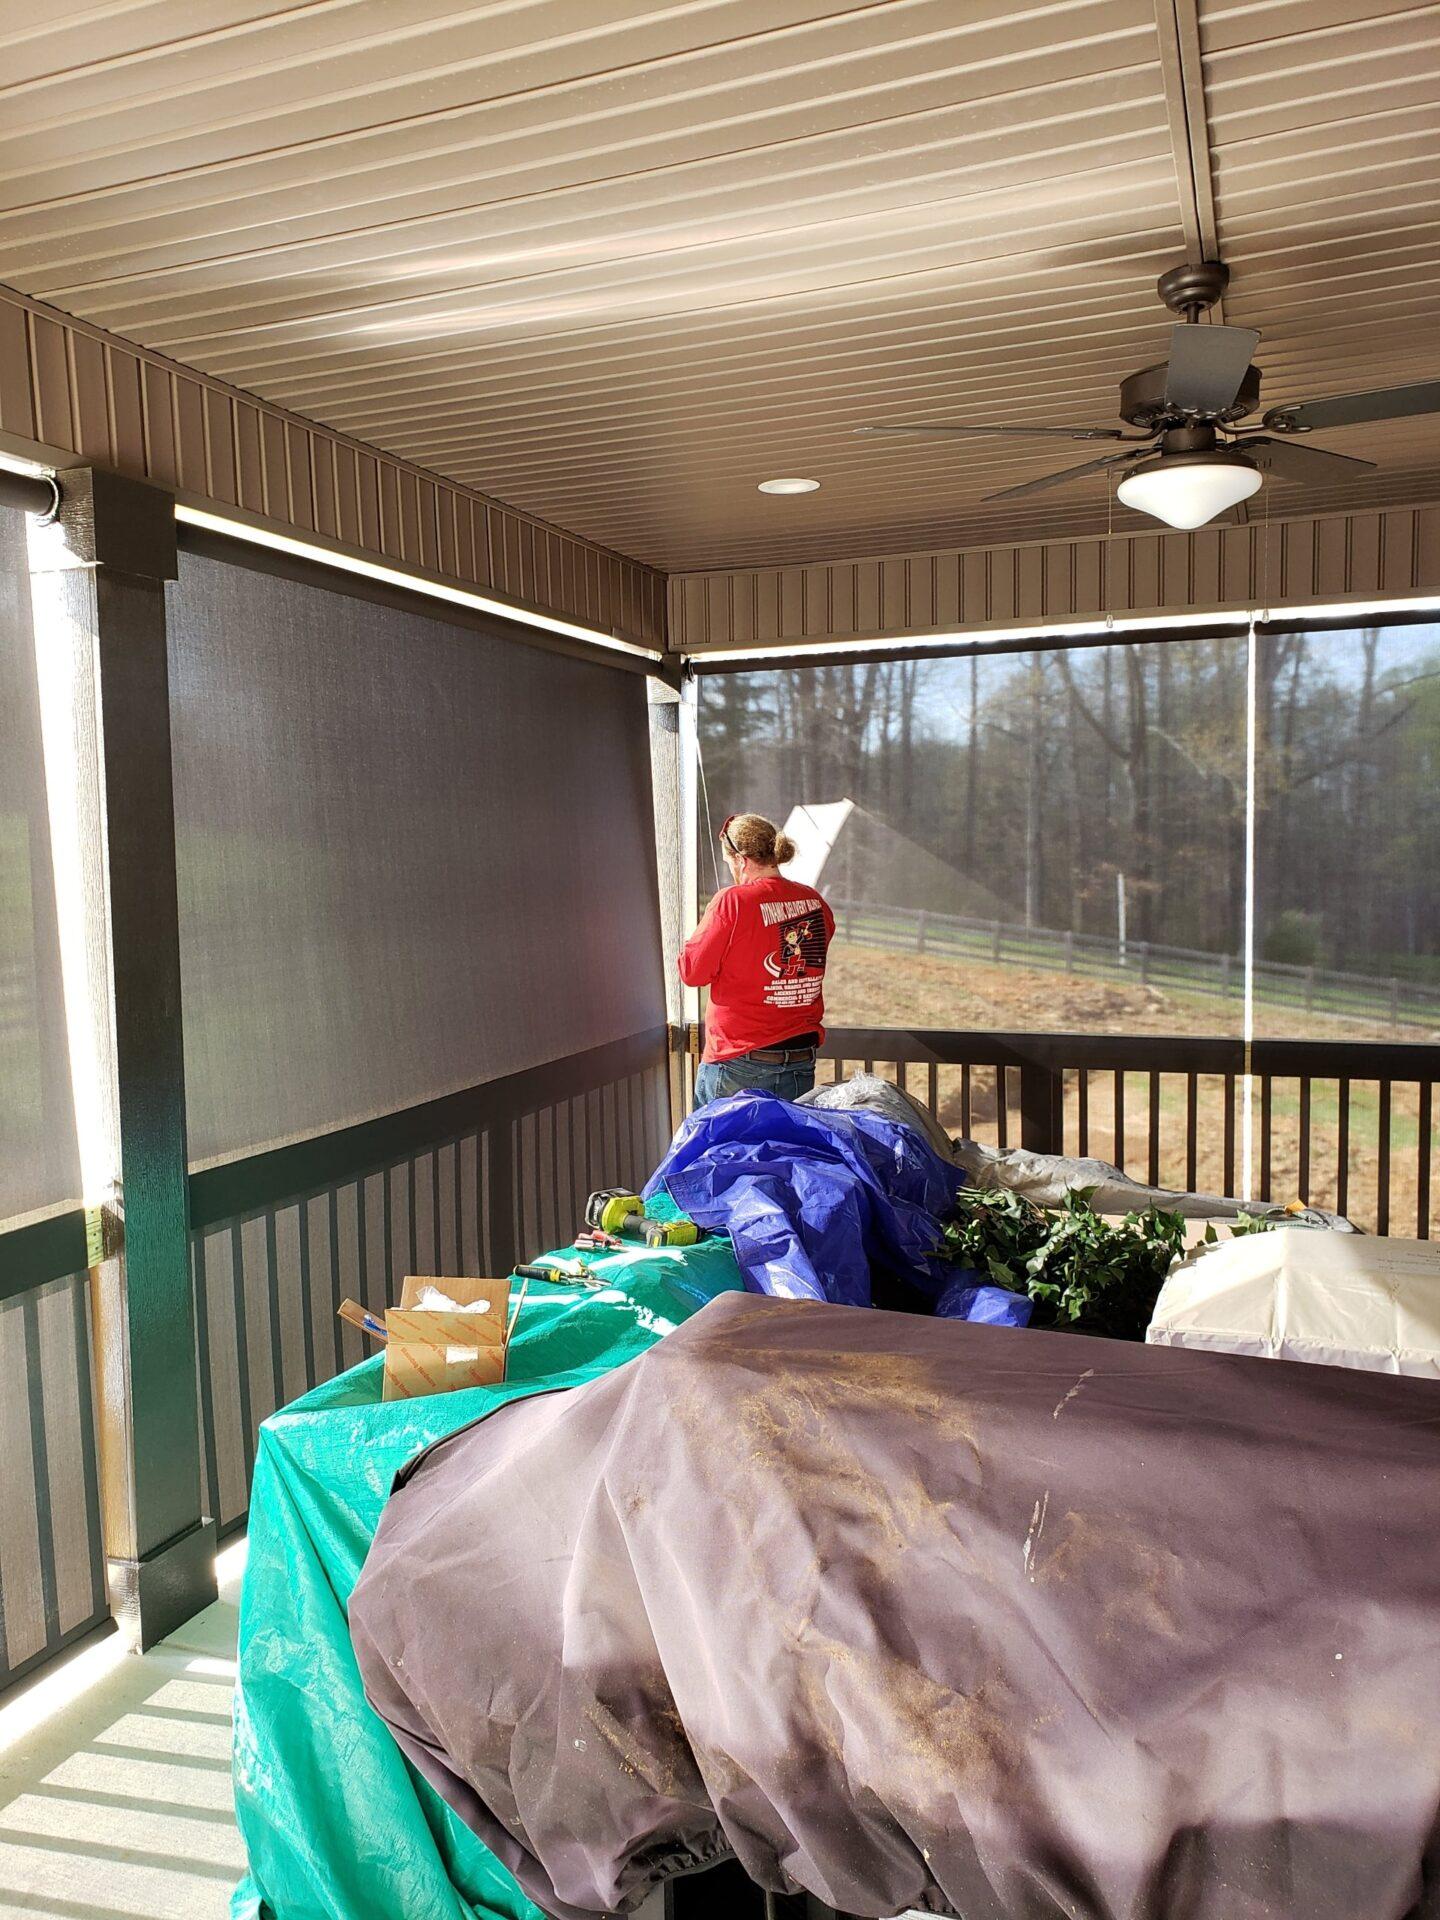 Color Patio Window Shades - Interior Window Plantation Shutters - Custom, Motorized Window Treatments, Blind Repair, Custom Blinds | Nashville, TN